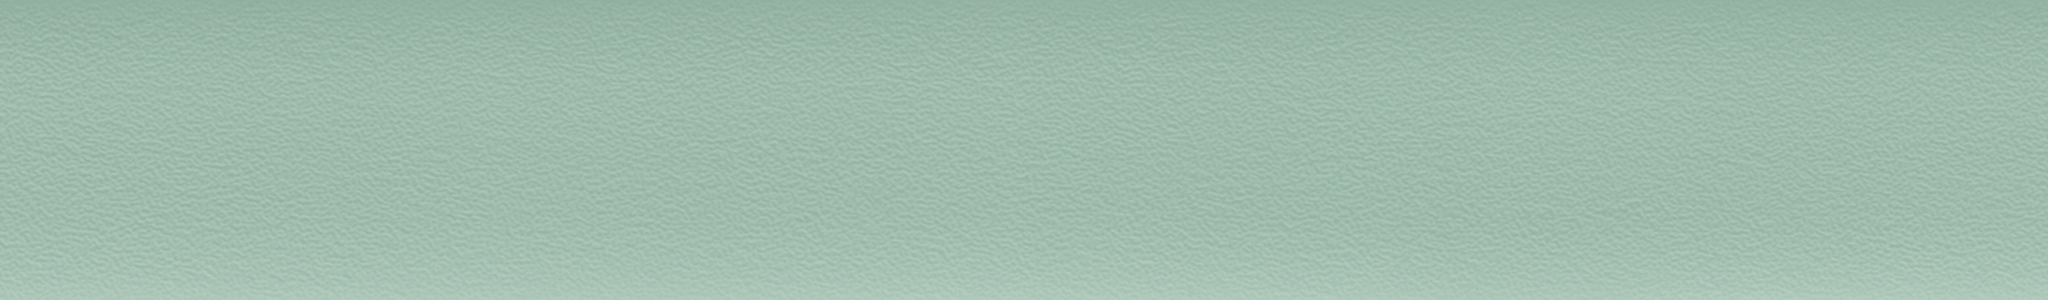 HU 16607 ABS hrana zelená perla 101